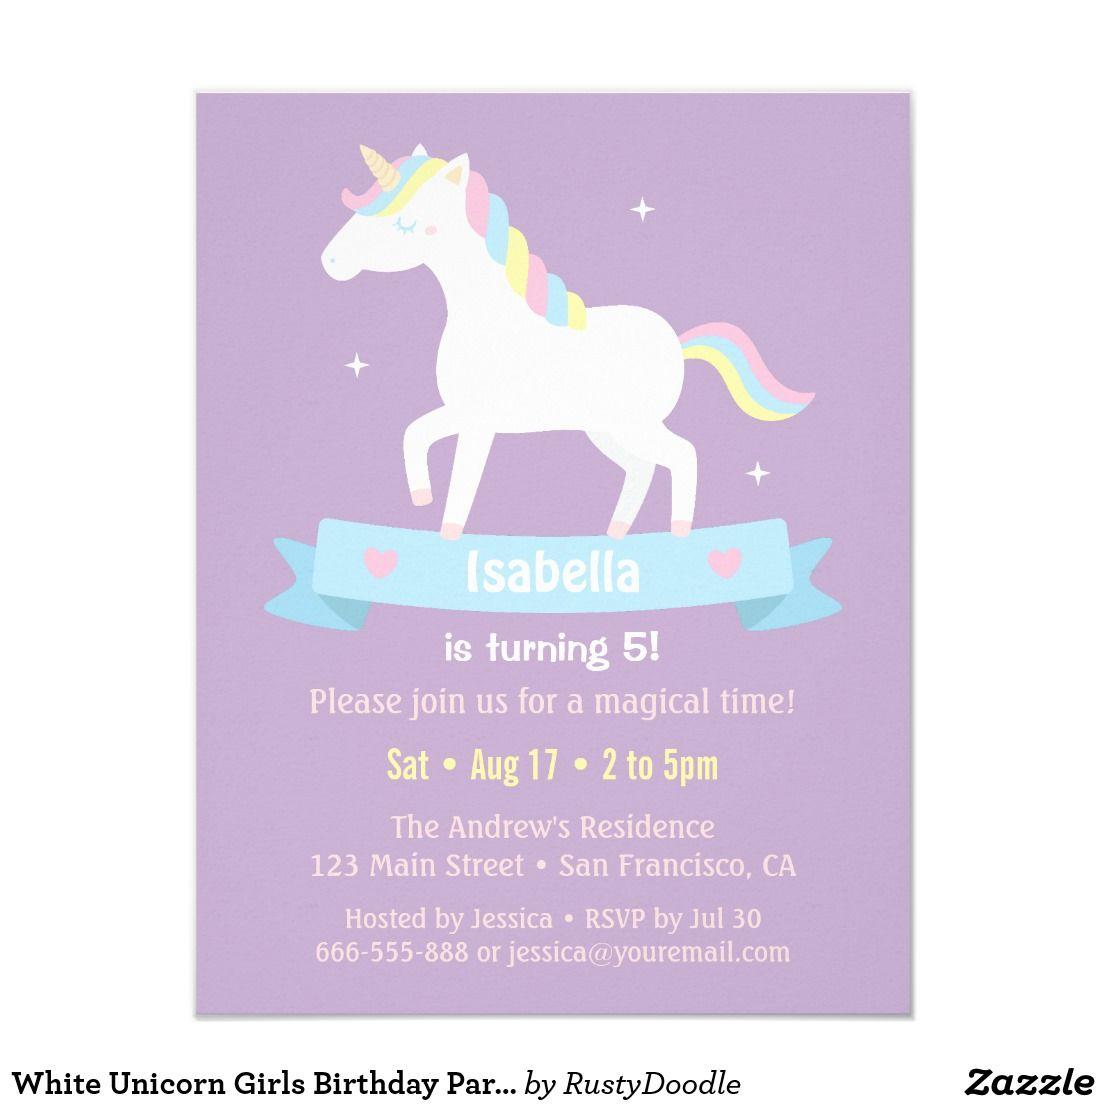 White Unicorn Girls Birthday Party Invitations | White unicorn, Girl ...